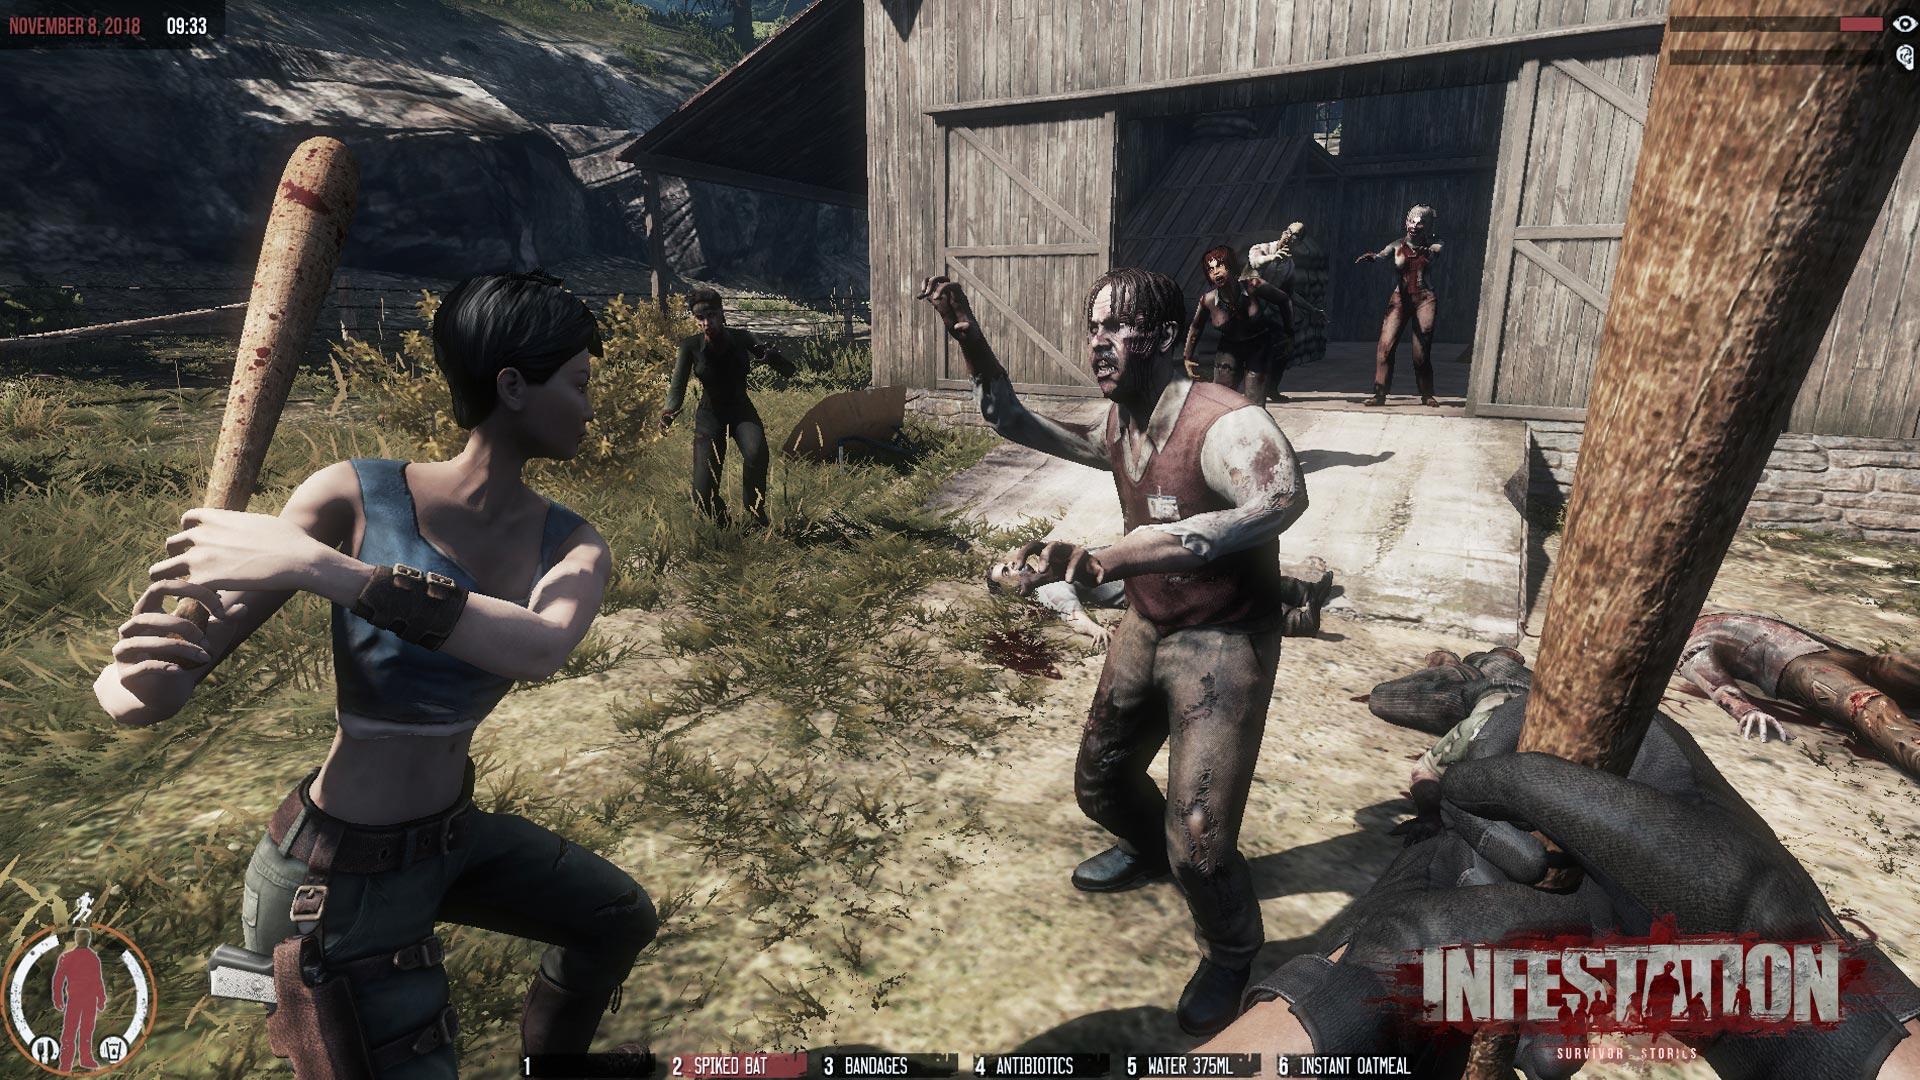 Infestation: Survivor Stories Pics, Video Game Collection